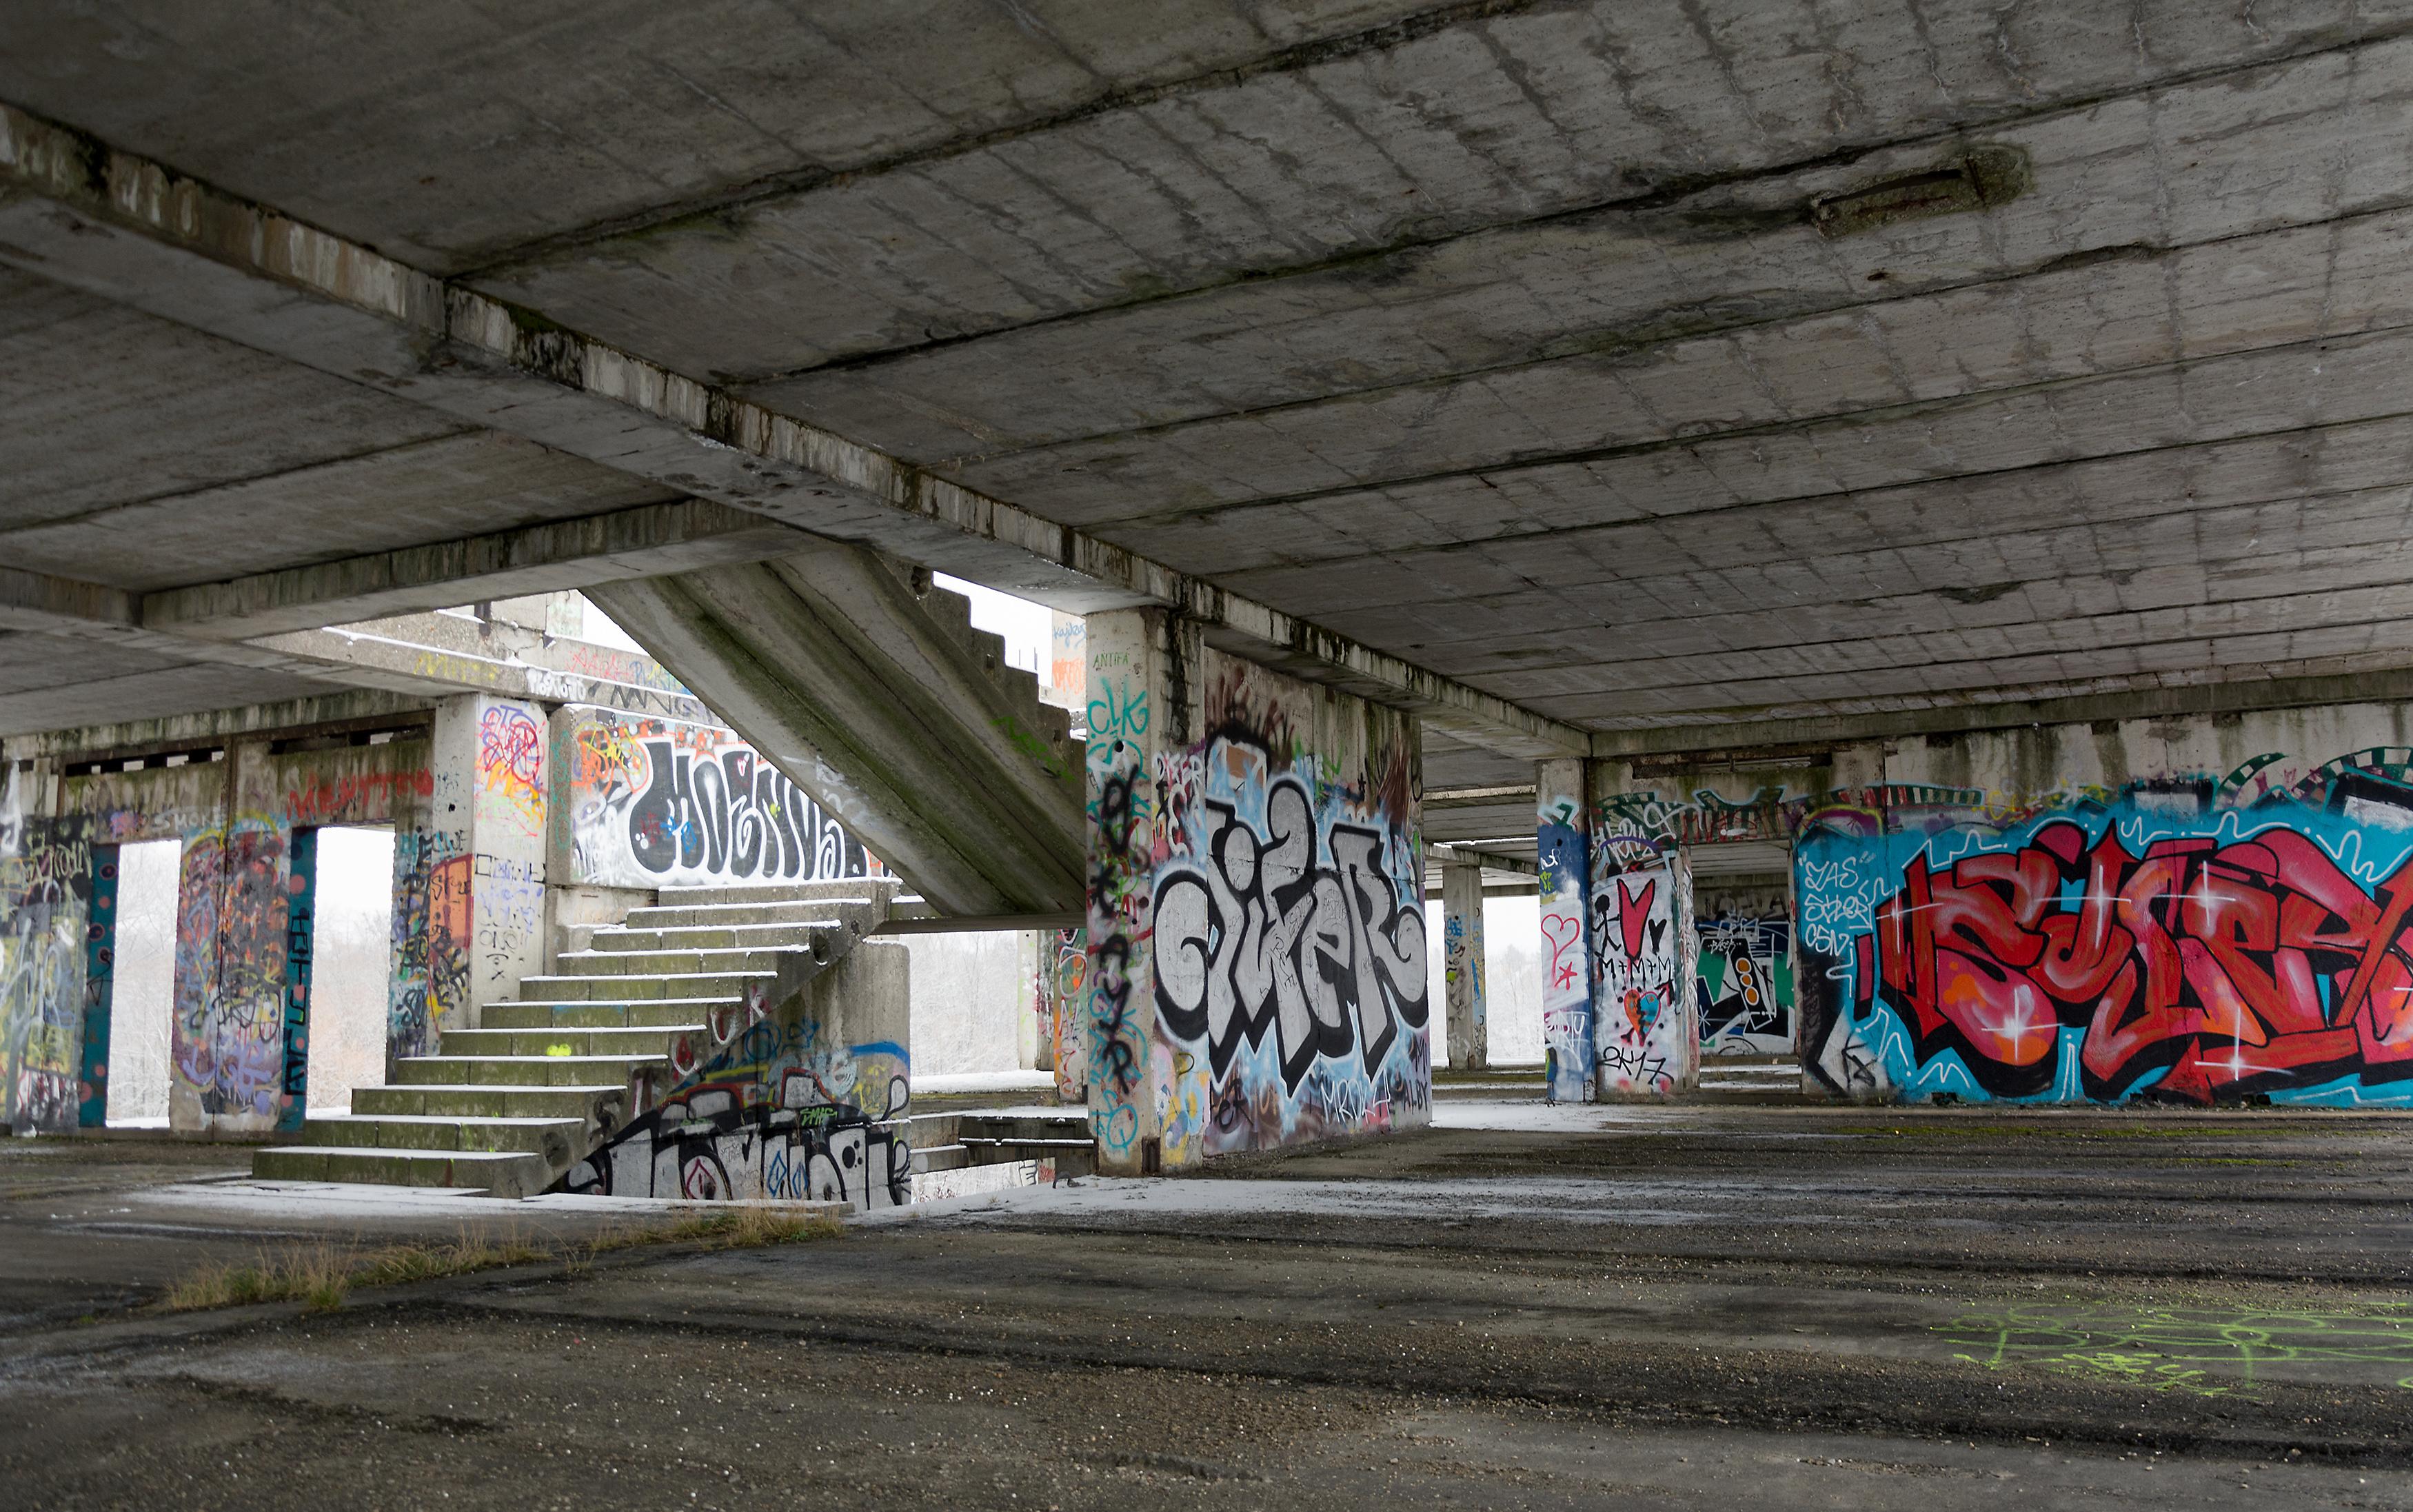 Free Image Urbex Urban Exploration